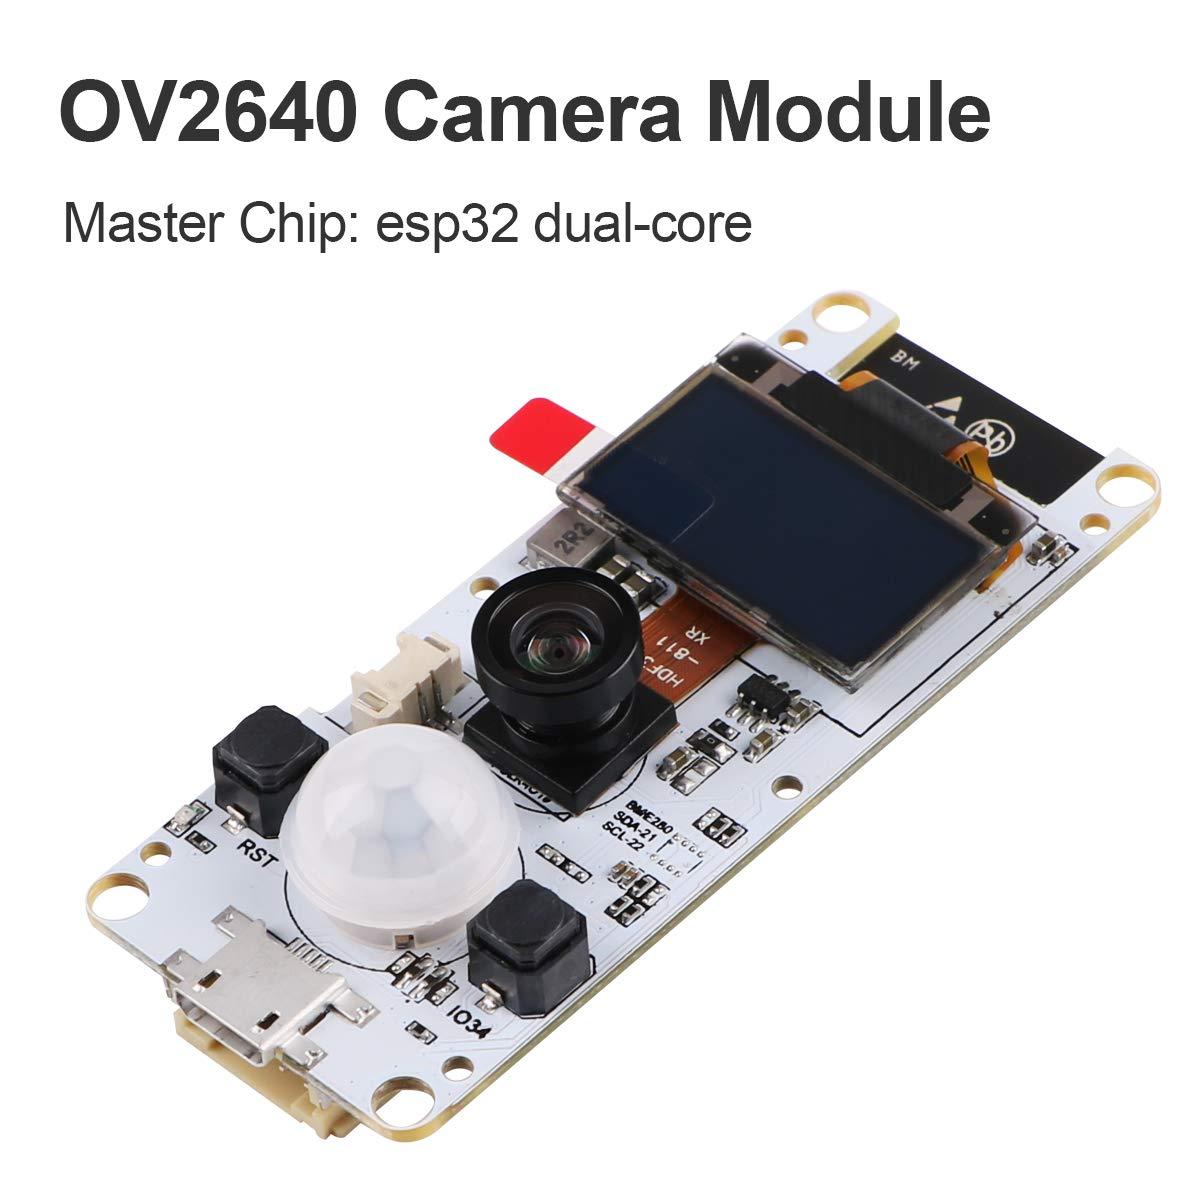 MakerHawk ESP32 Camera Module T-Camera ESP32 WROVER PSRAM Camera Module  4MBytes SPRAM ESP32-WROVER-B OV2640 Camera Module with 0 96 Inch  OLED-Fish-Eye